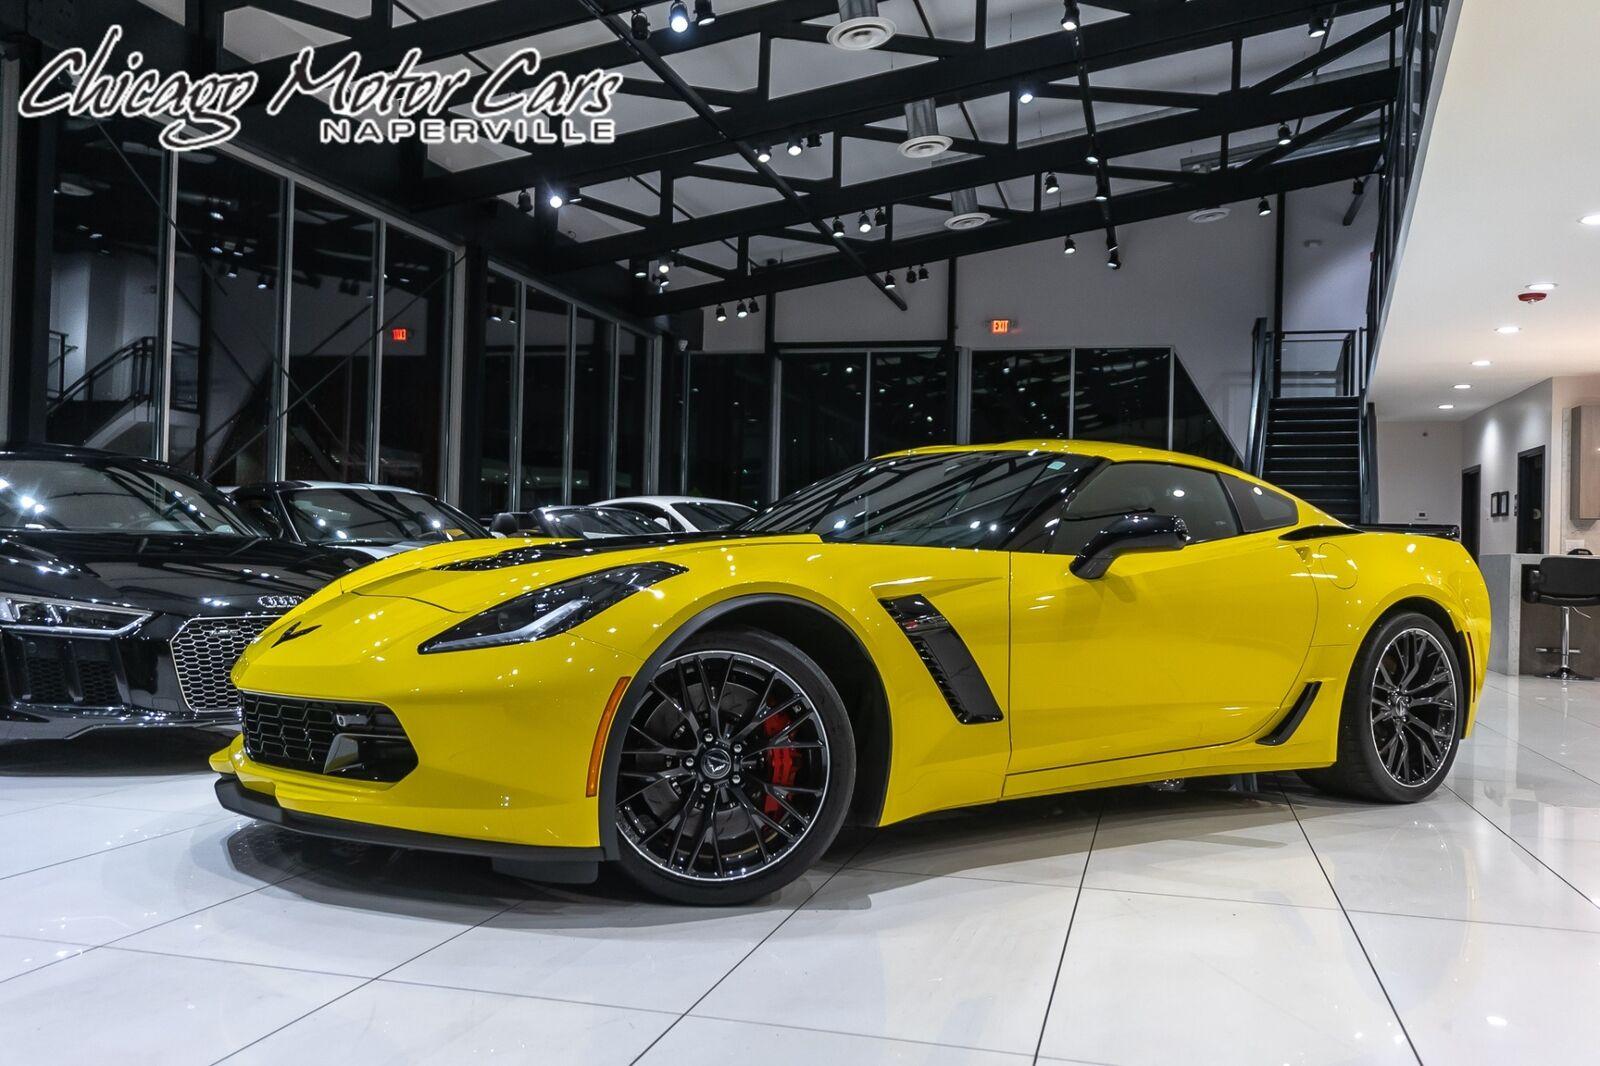 2016 Yellow Chevrolet Corvette Coupe 2LZ   C7 Corvette Photo 1